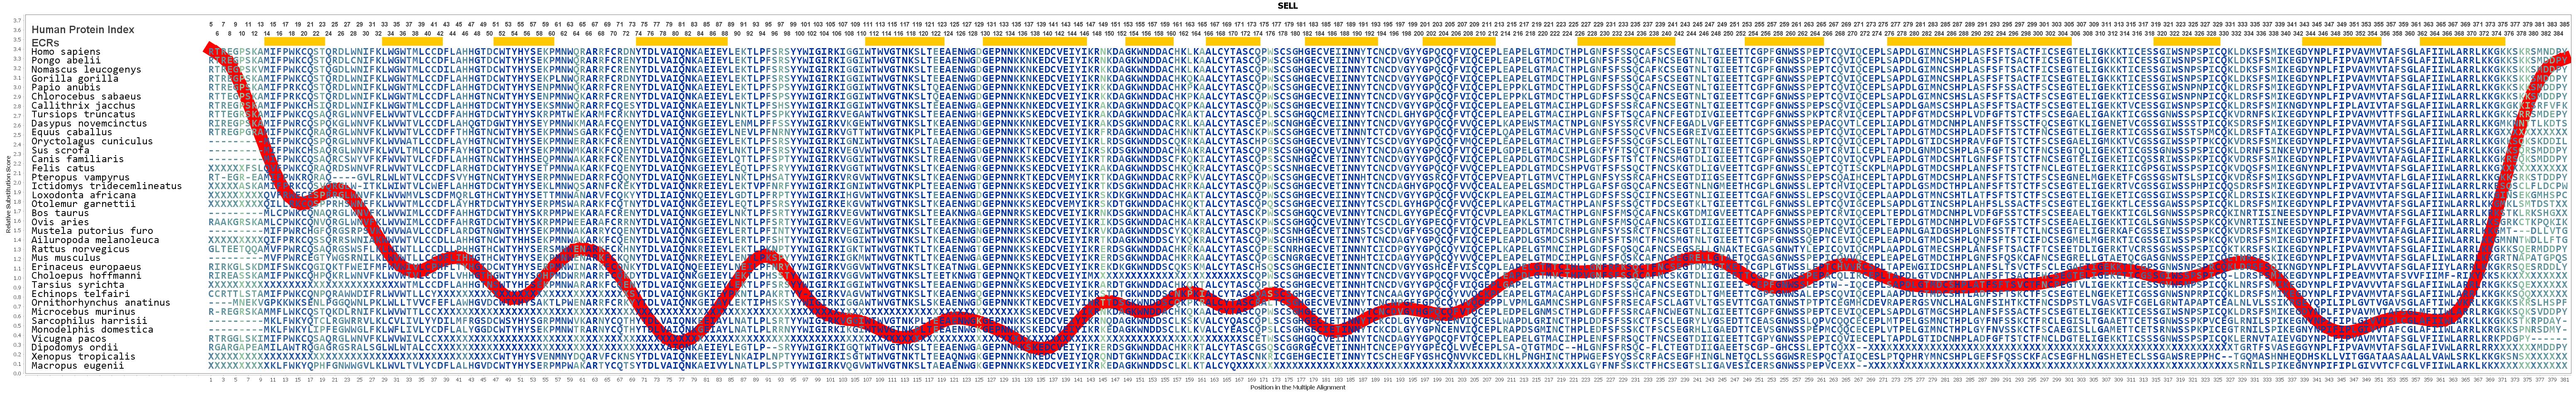 SELL Gene GeneCards LYAM1 Protein